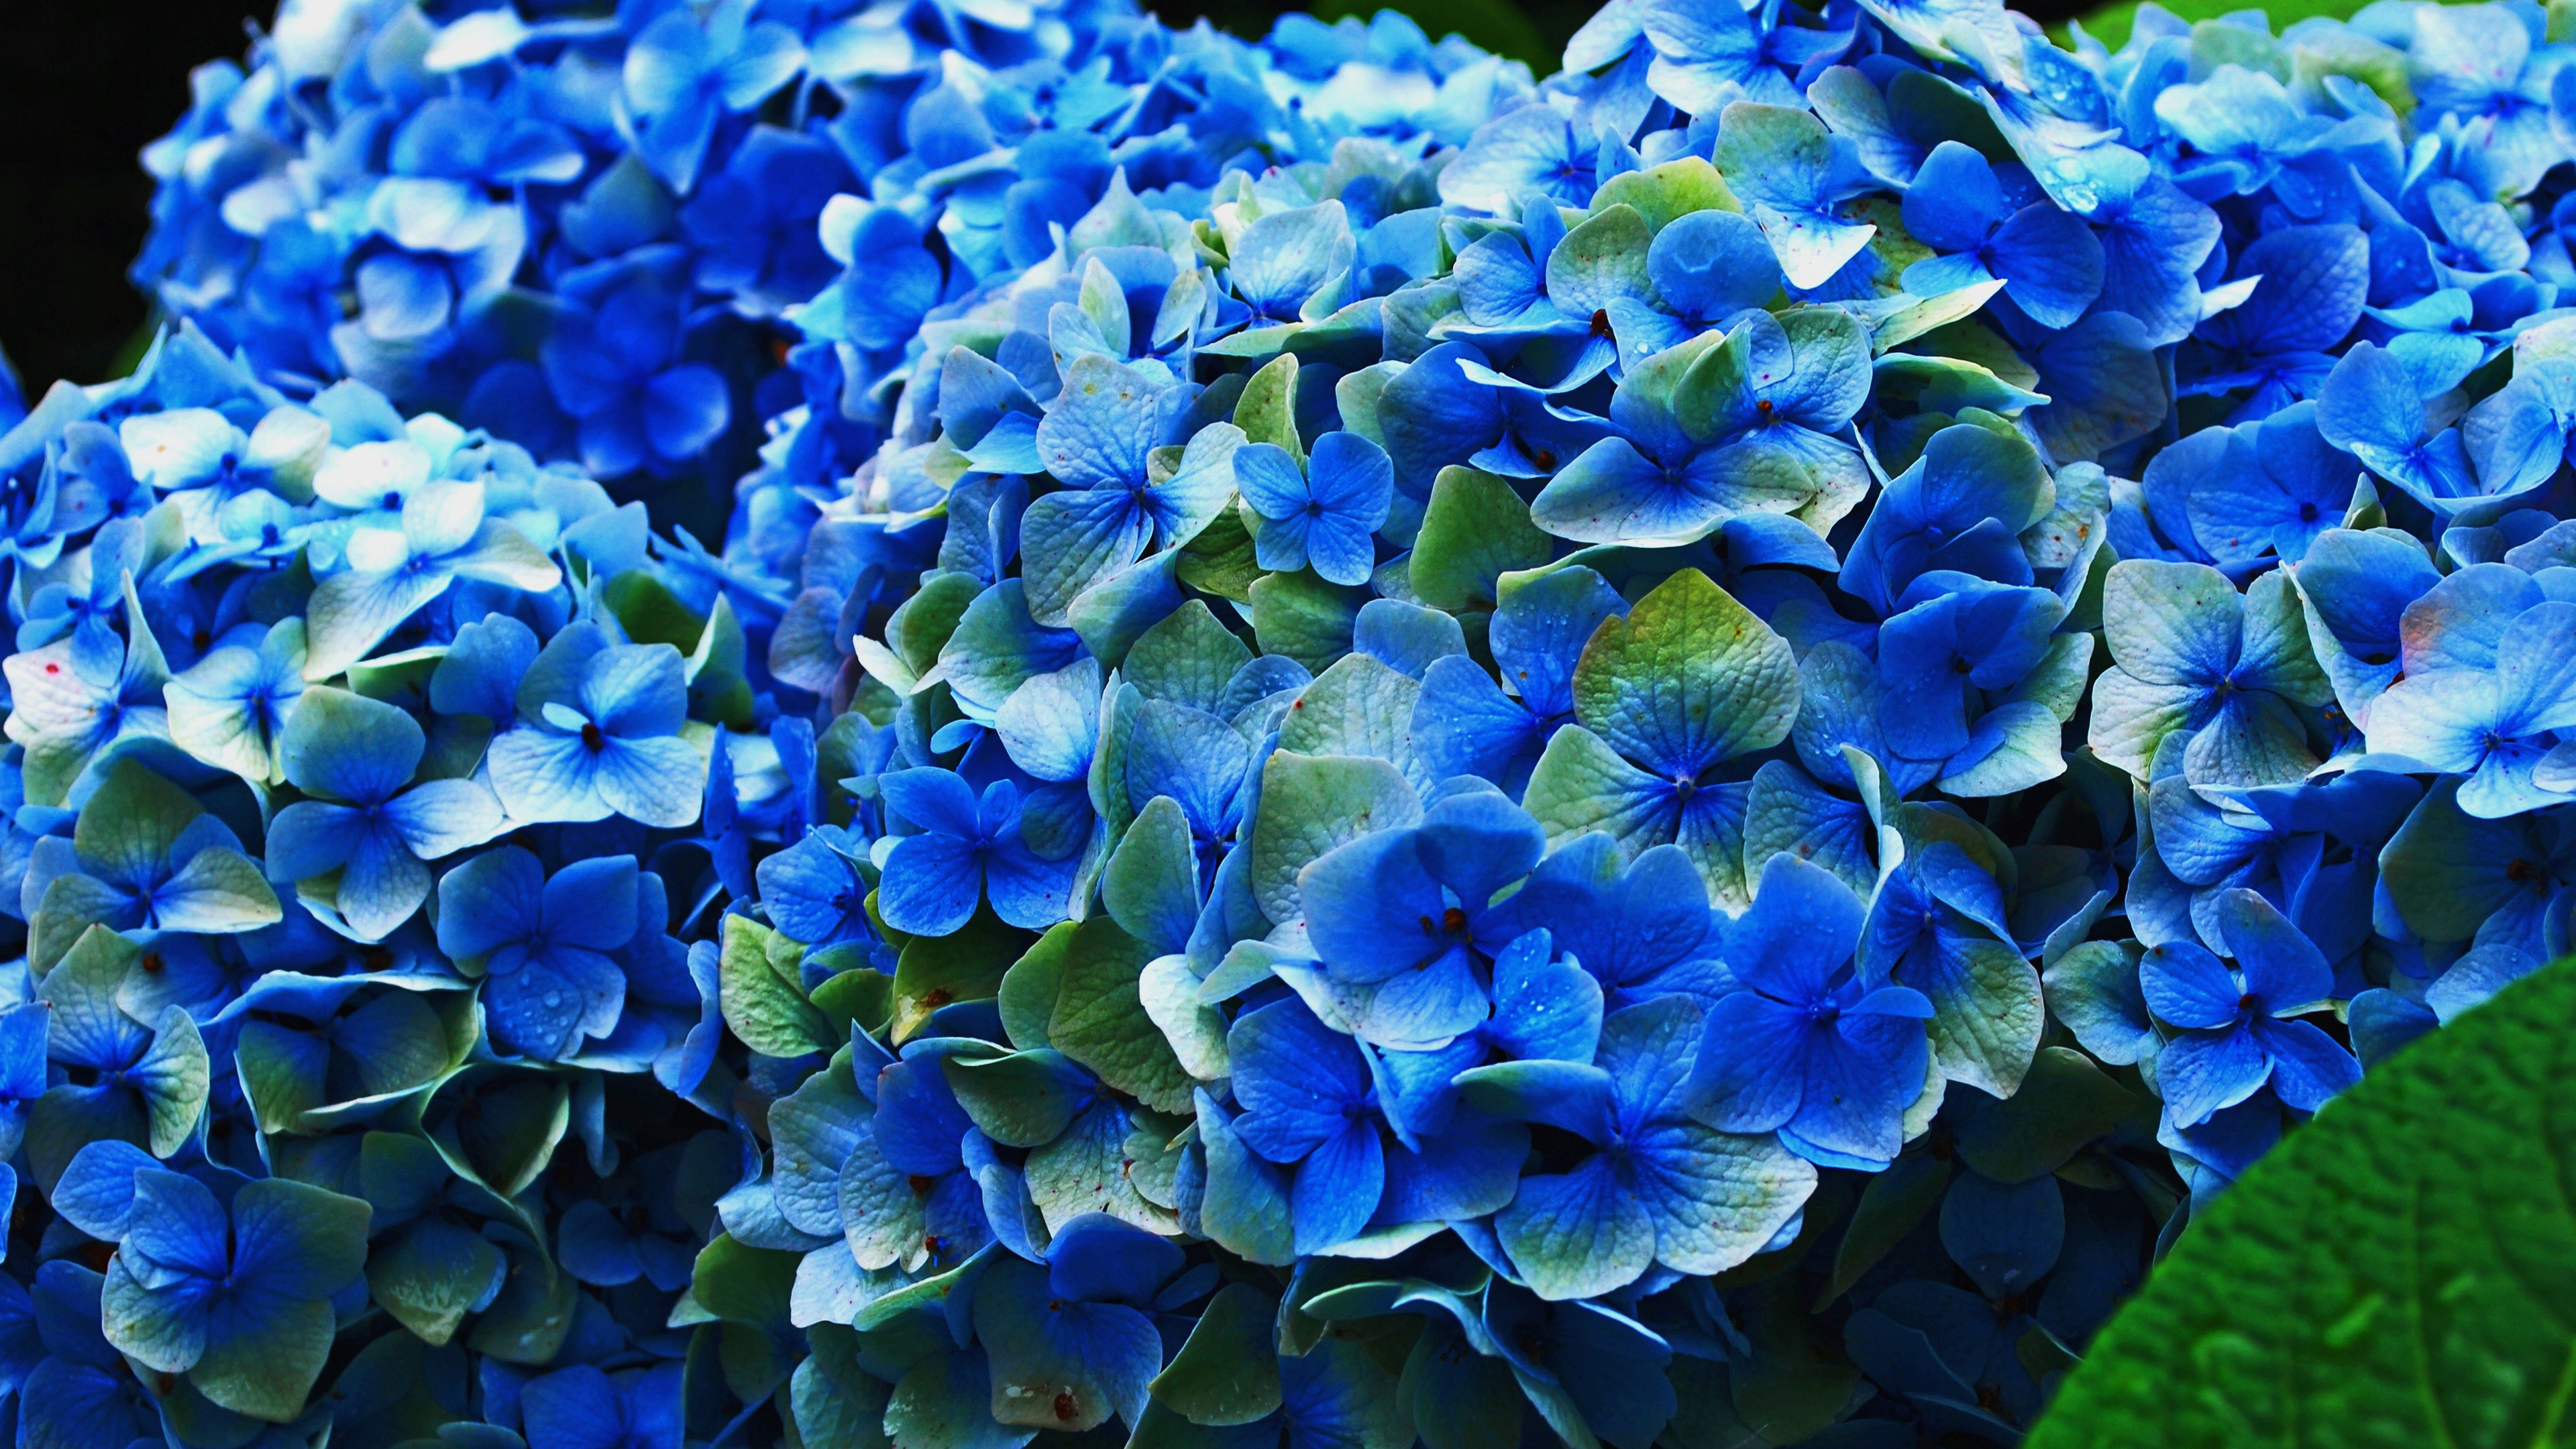 Blue Hydrangea Flowers Flowering 1080x1920 Iphone 8 7 6 6s Plus